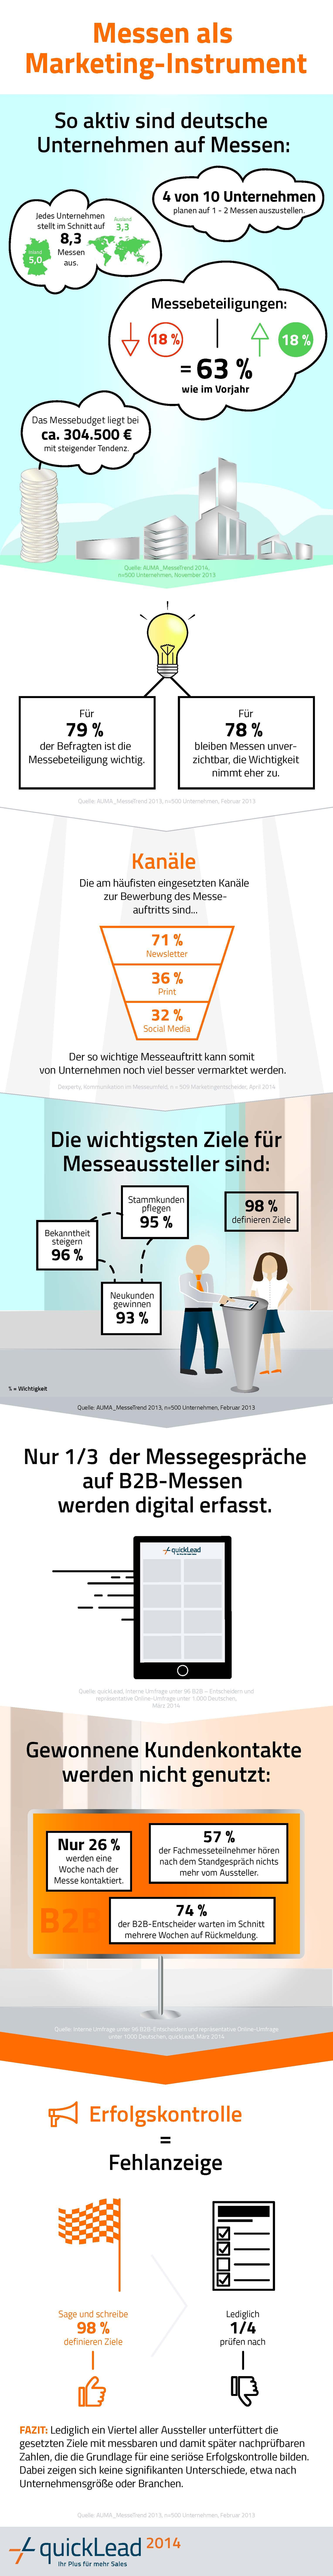 messemarketing, messe-auftritt, infografik